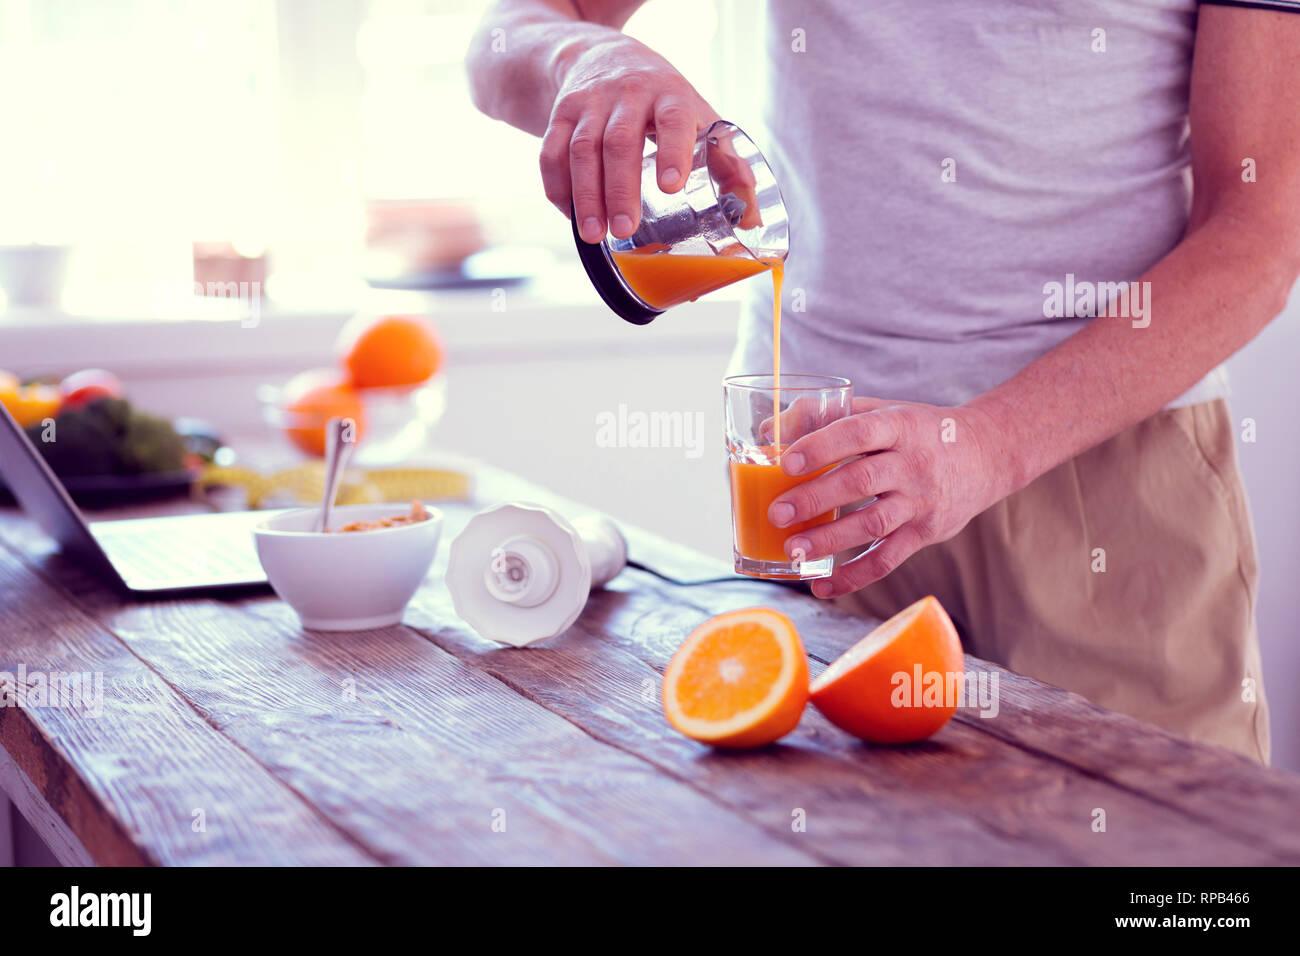 Experimentada deportista beber zumo de naranja en la mañana cada día Imagen De Stock